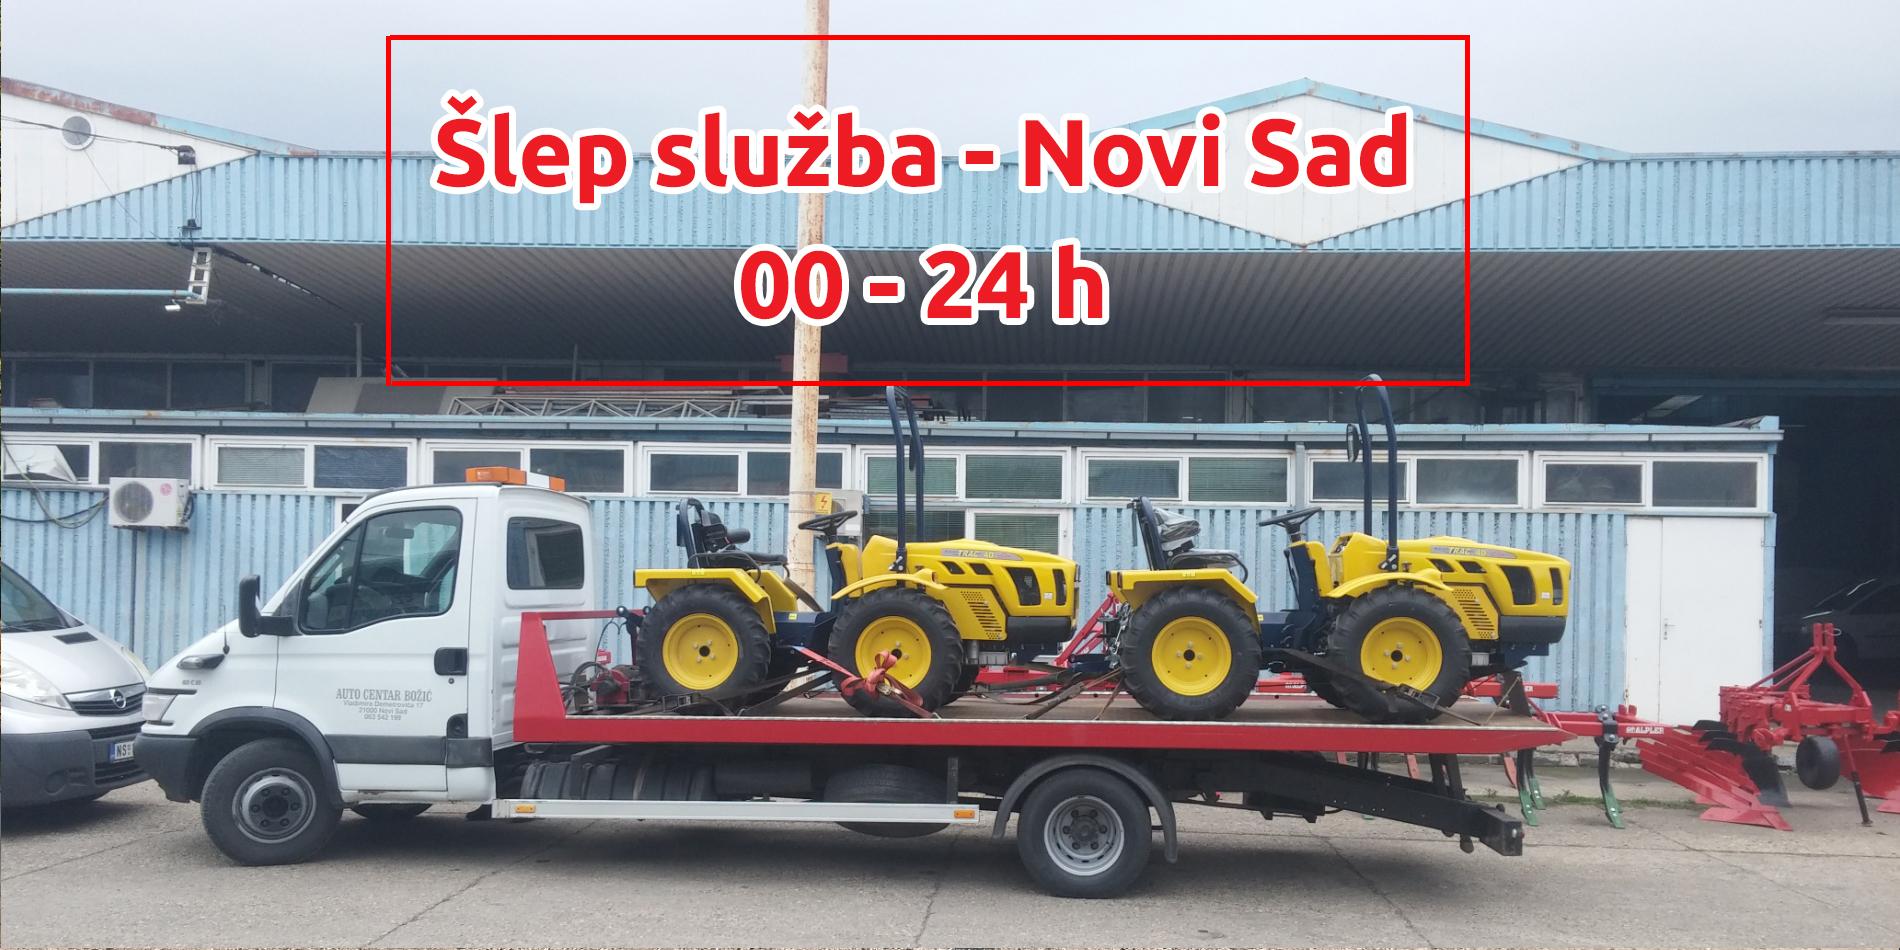 slep-sluzba-bozic-novi-sad-12